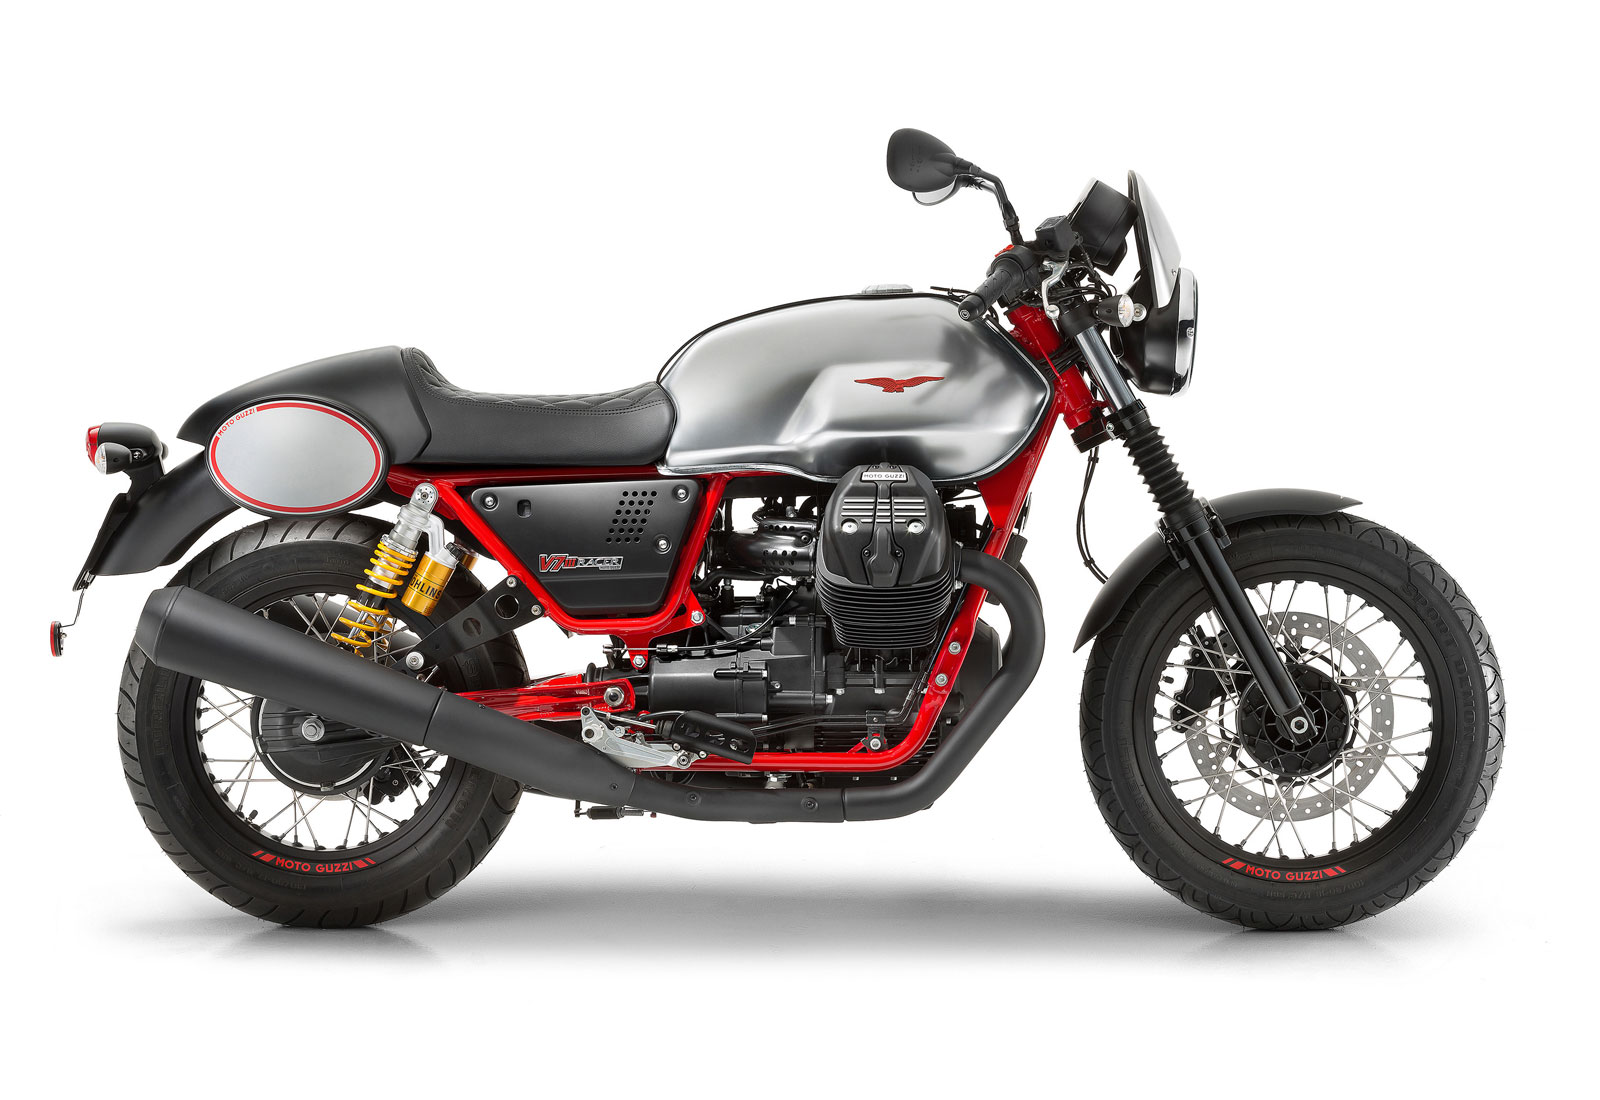 Moto de perfil, modelo Racer, color gris con detalles en rojo. Marca Motoguzzi